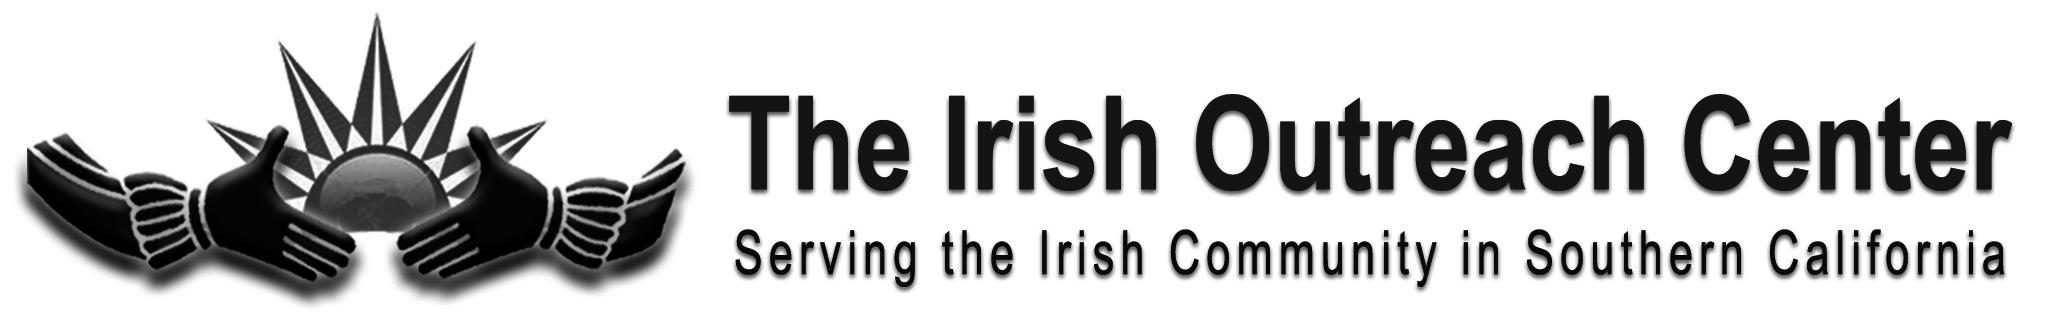 irish outreach LOGO